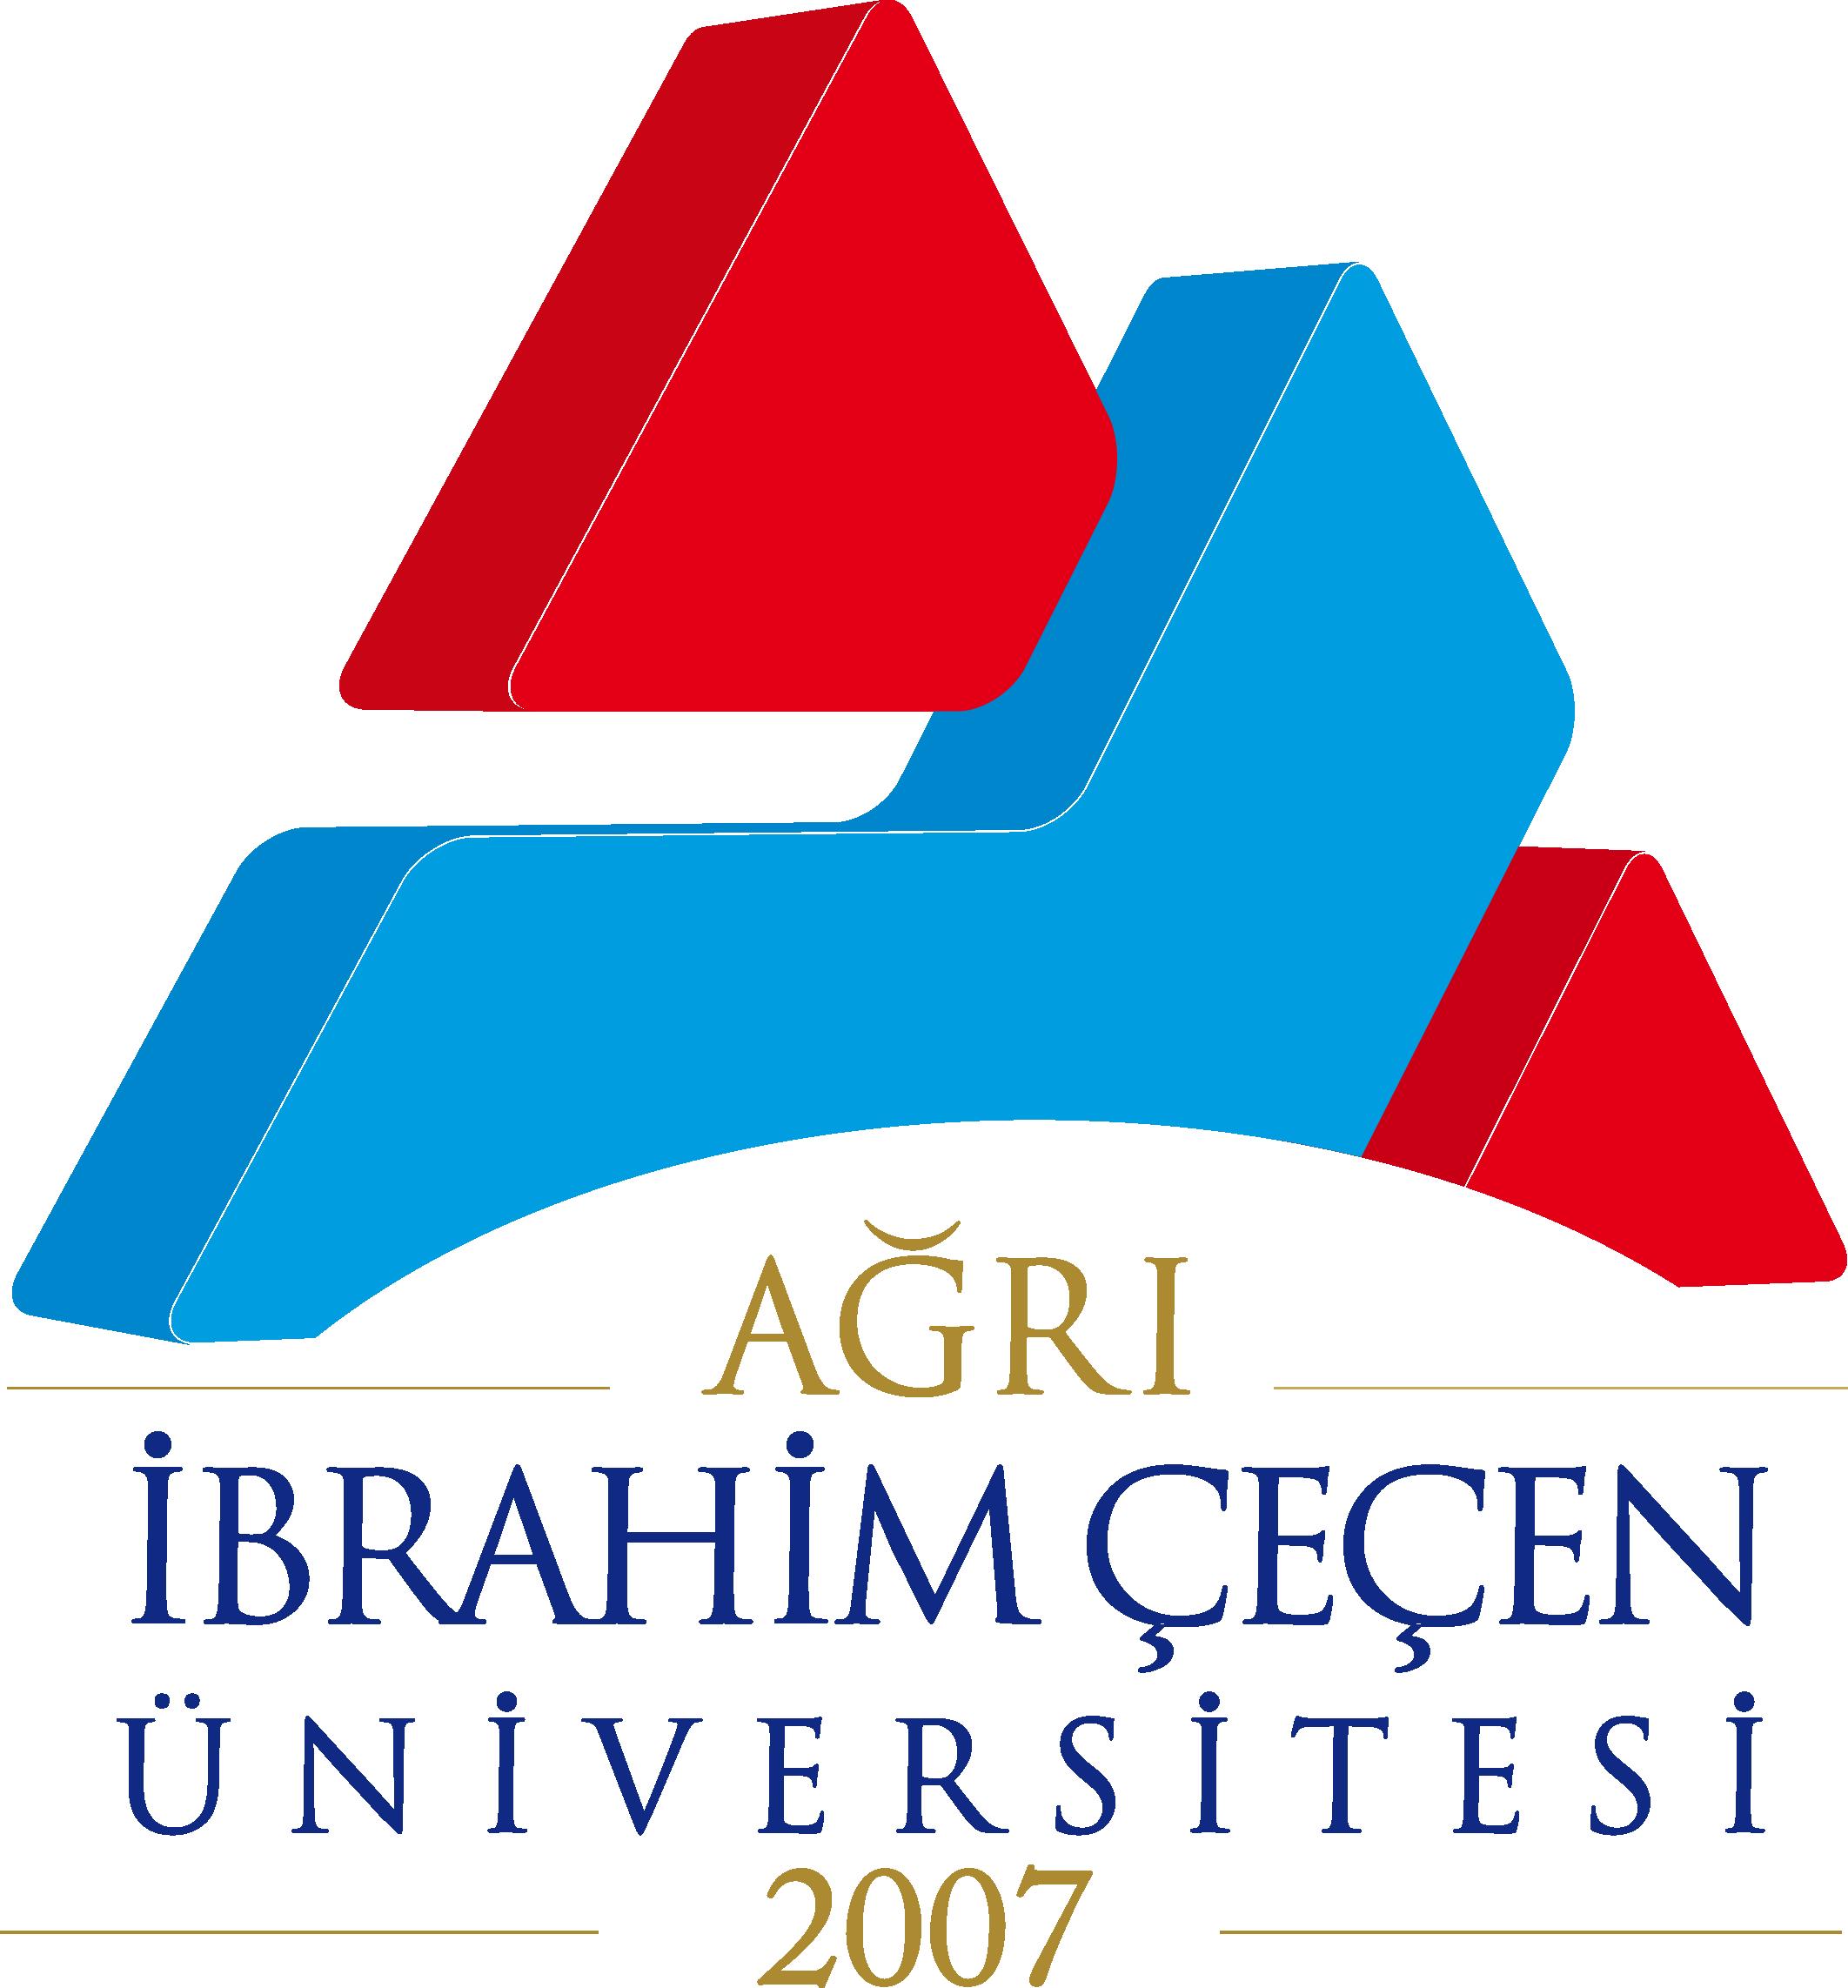 AGRI IBRAHIM CECEN UNIVERSITY